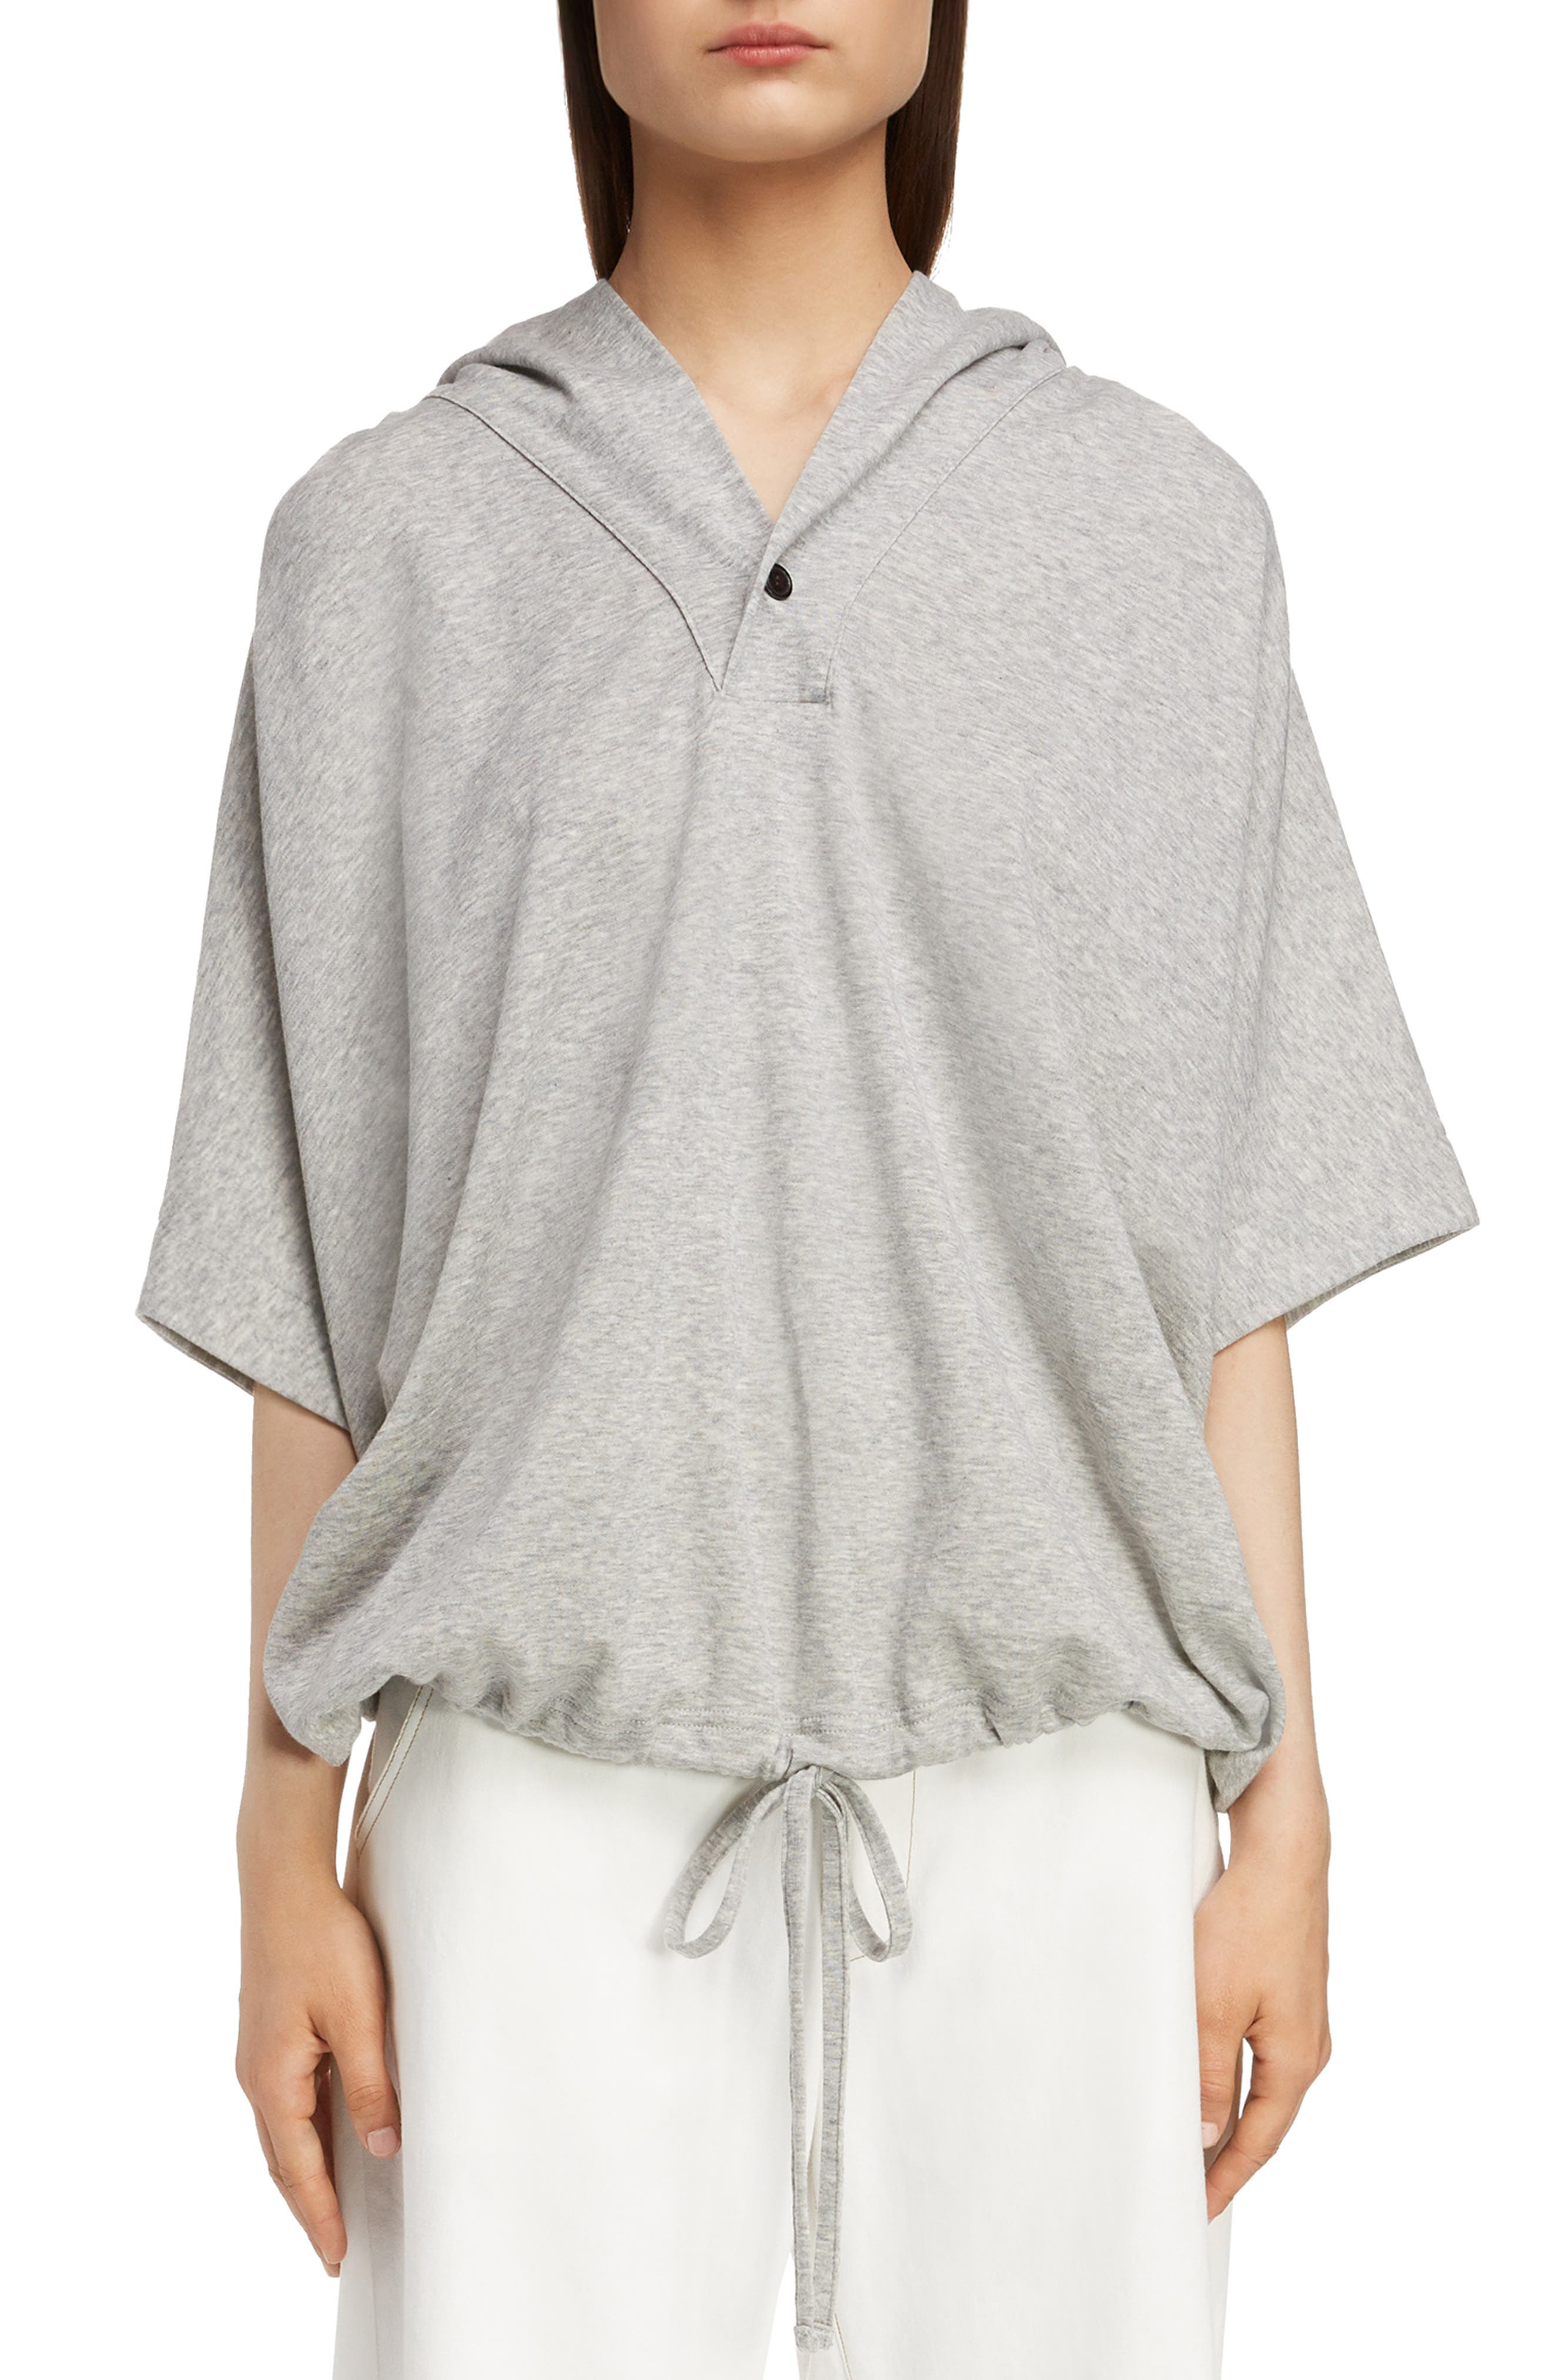 Dolman Sleeve Hoodie,                         Main,                         color, LIGHT GREY